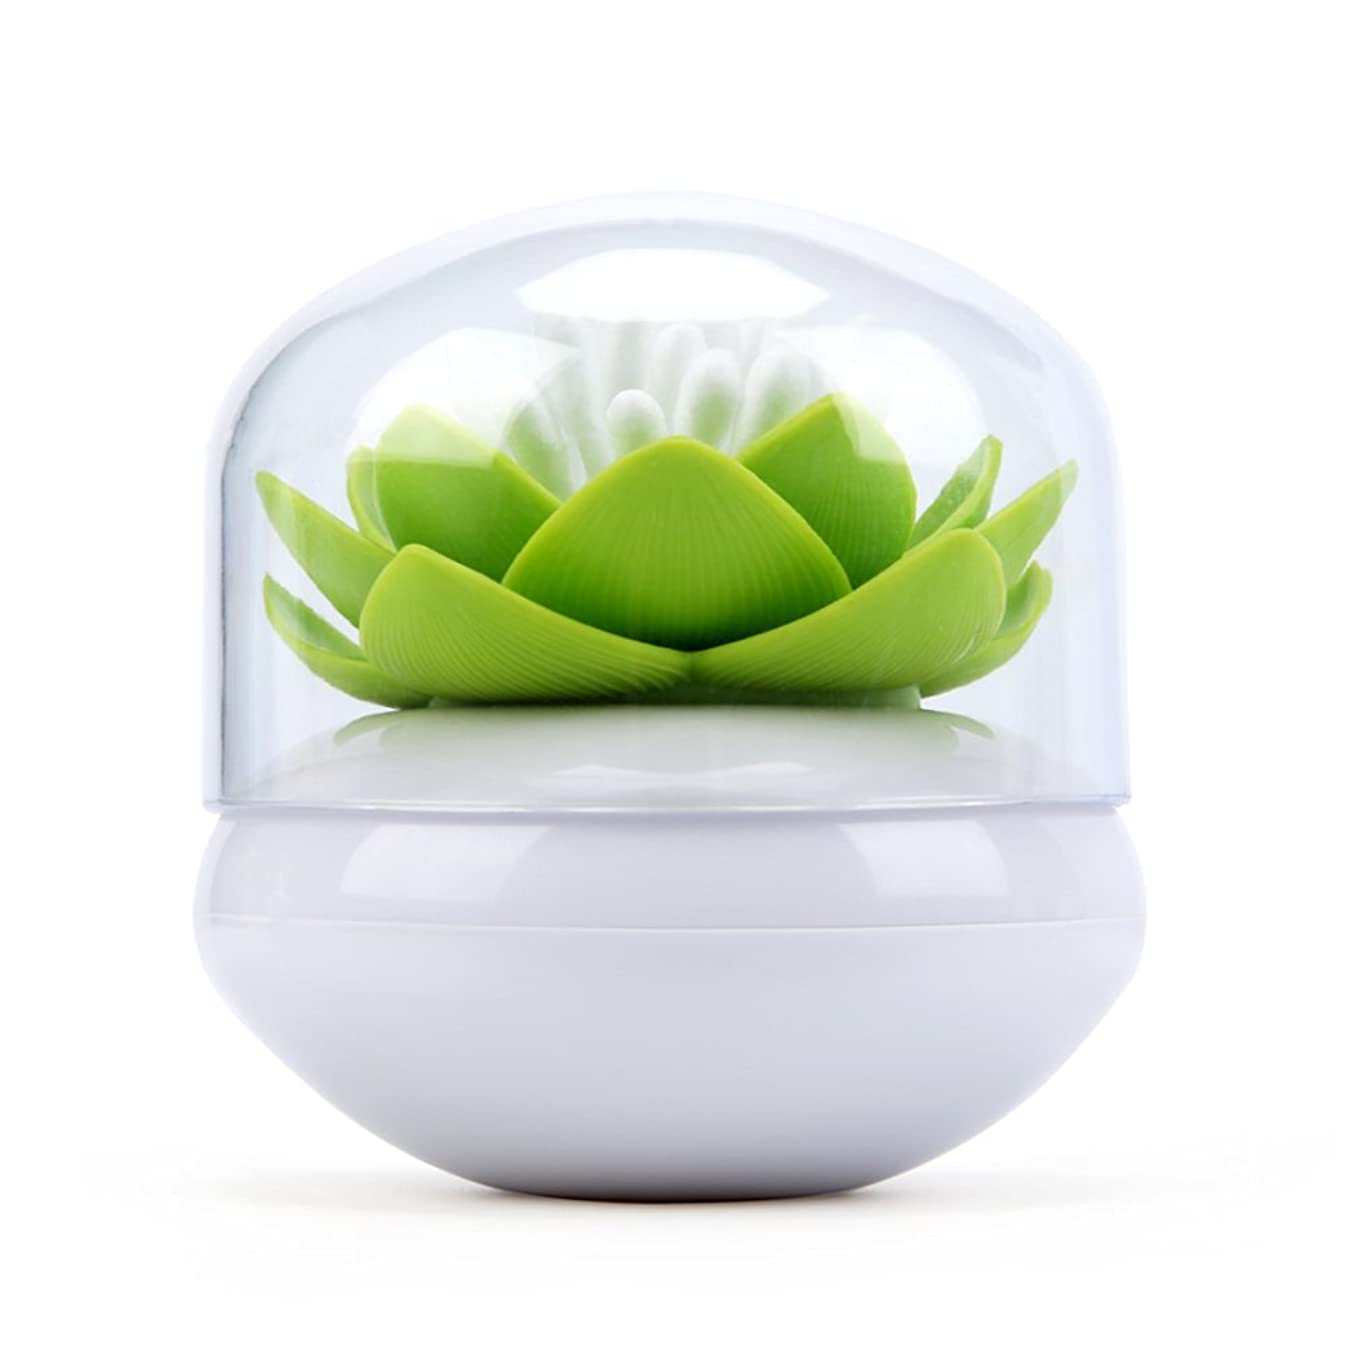 Bloss Cotton Swab Holder Q-Tips Holder Lotus Toothpick Holder Small Toothpick Case Toothpicks Organizer Bathroom Vanity Canister -Green